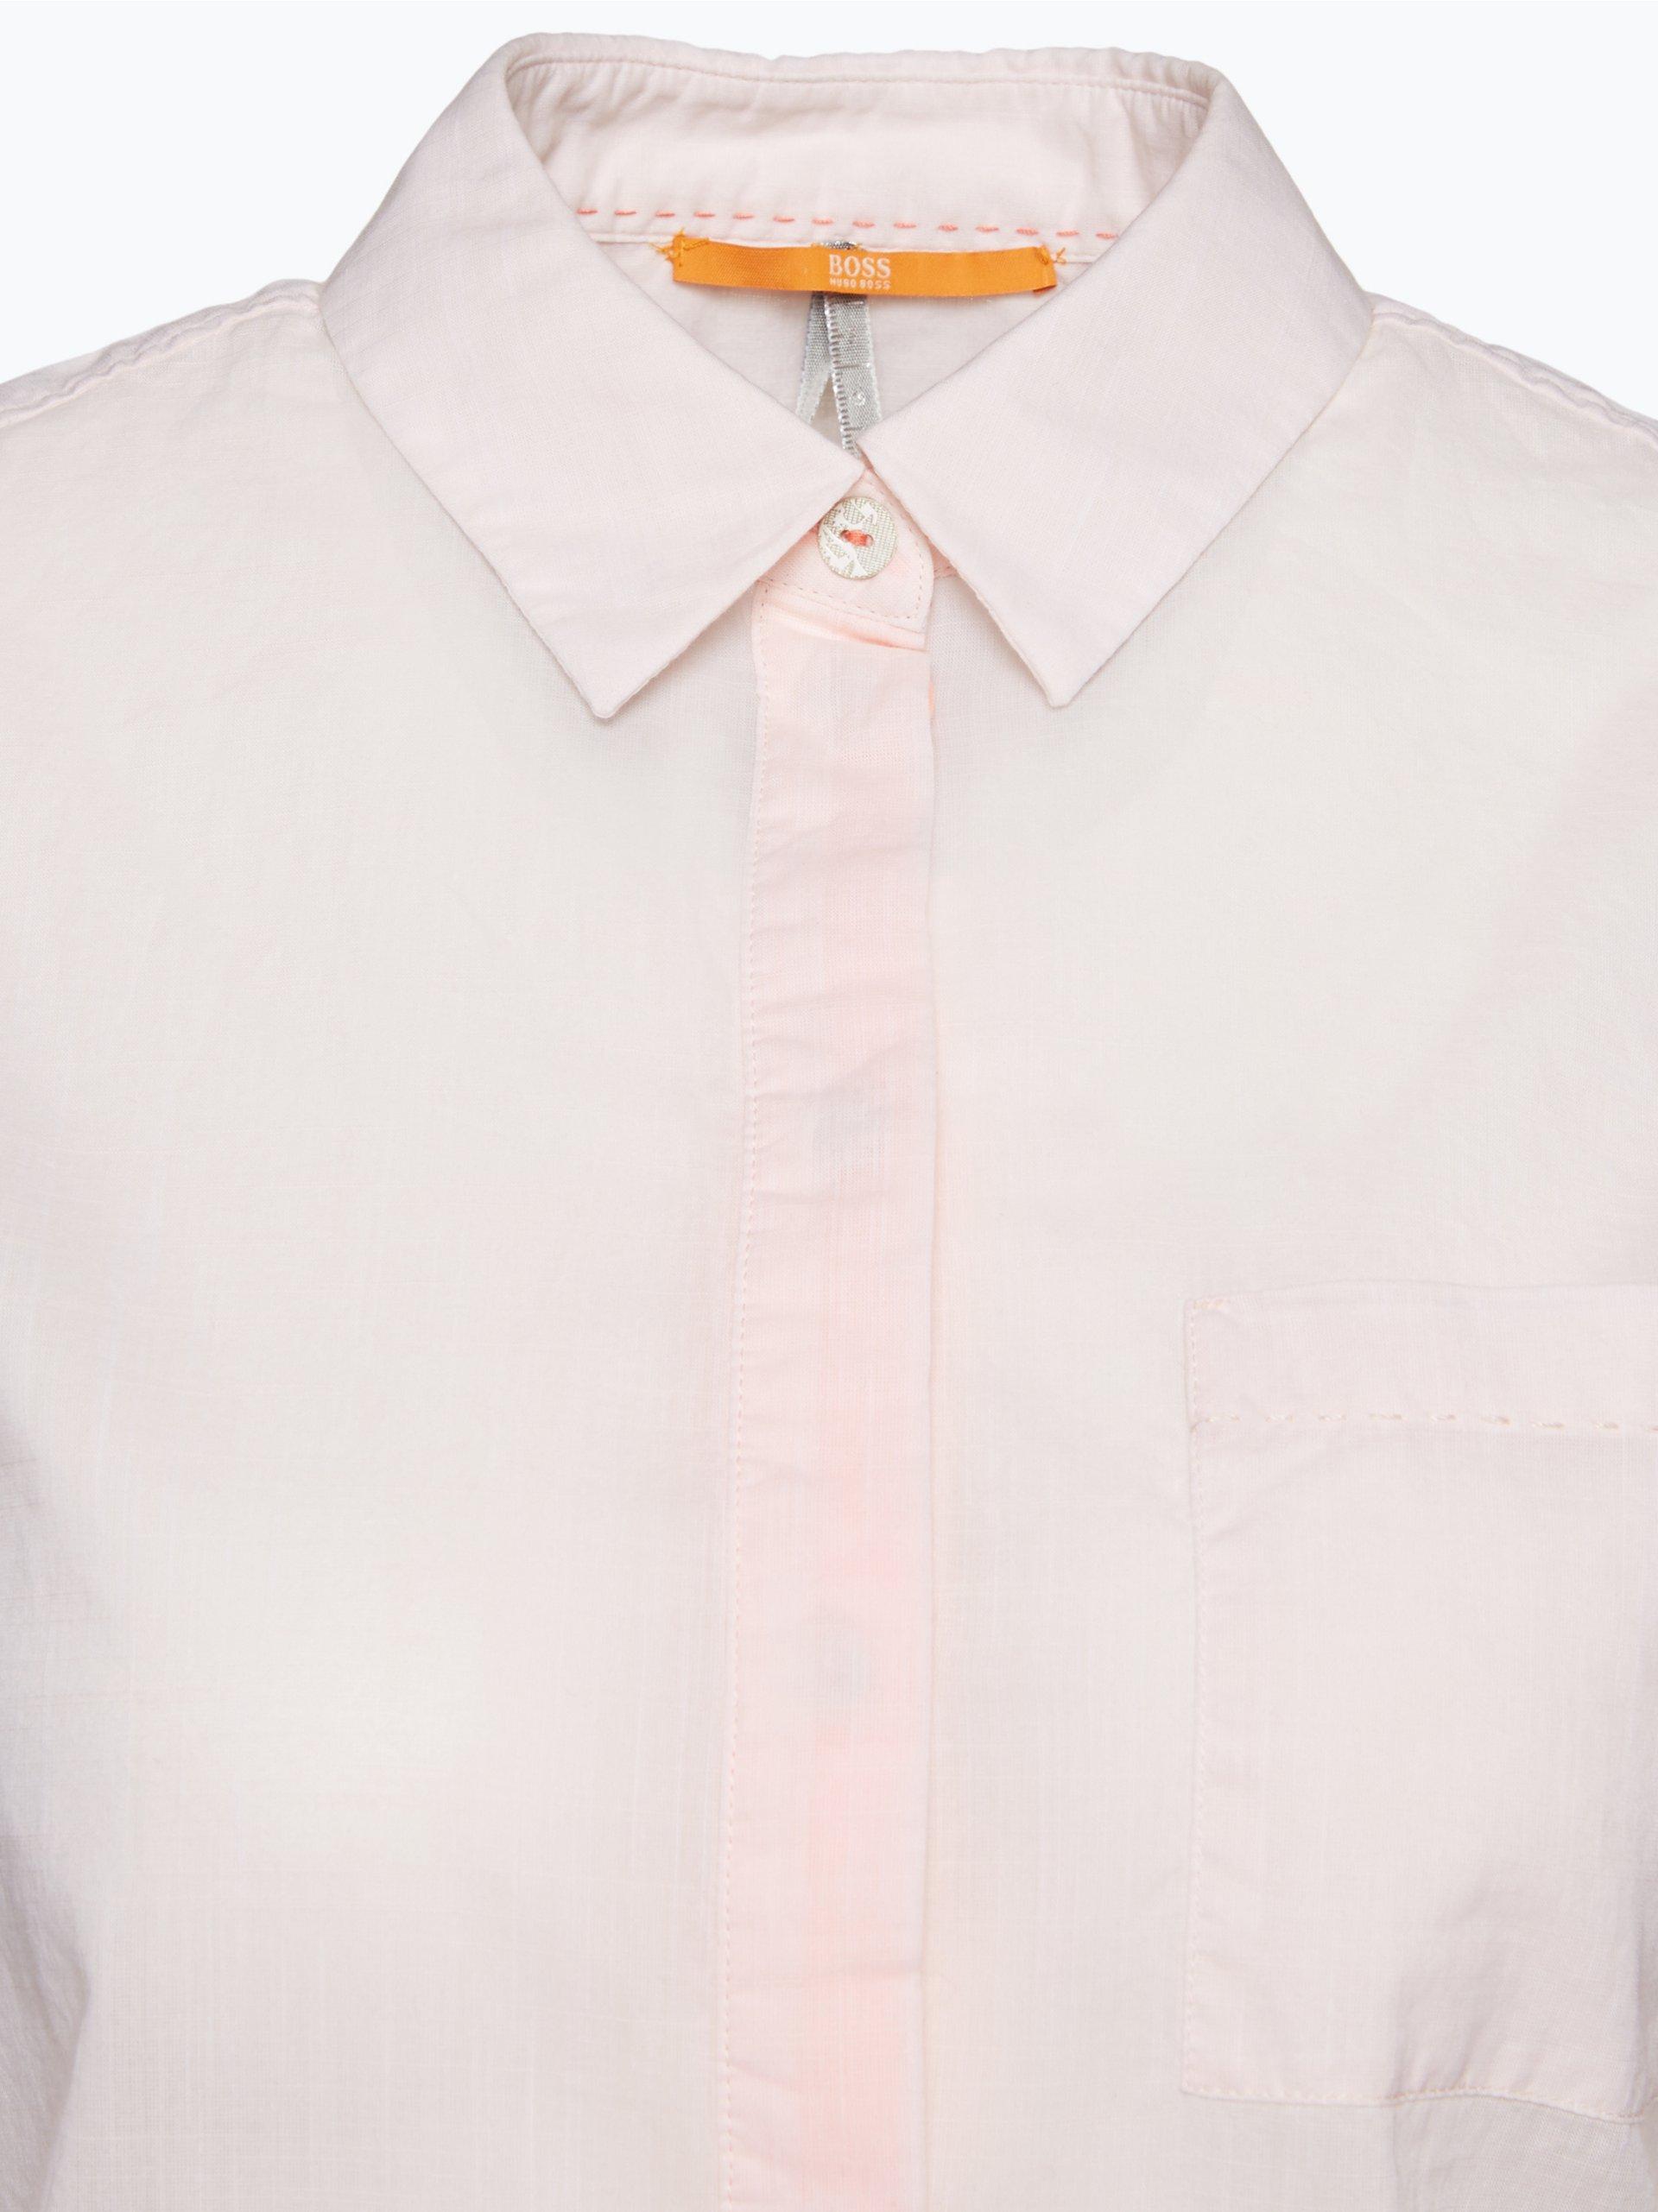 boss orange damen bluse egyp rosa uni online kaufen peek und cloppenburg de. Black Bedroom Furniture Sets. Home Design Ideas